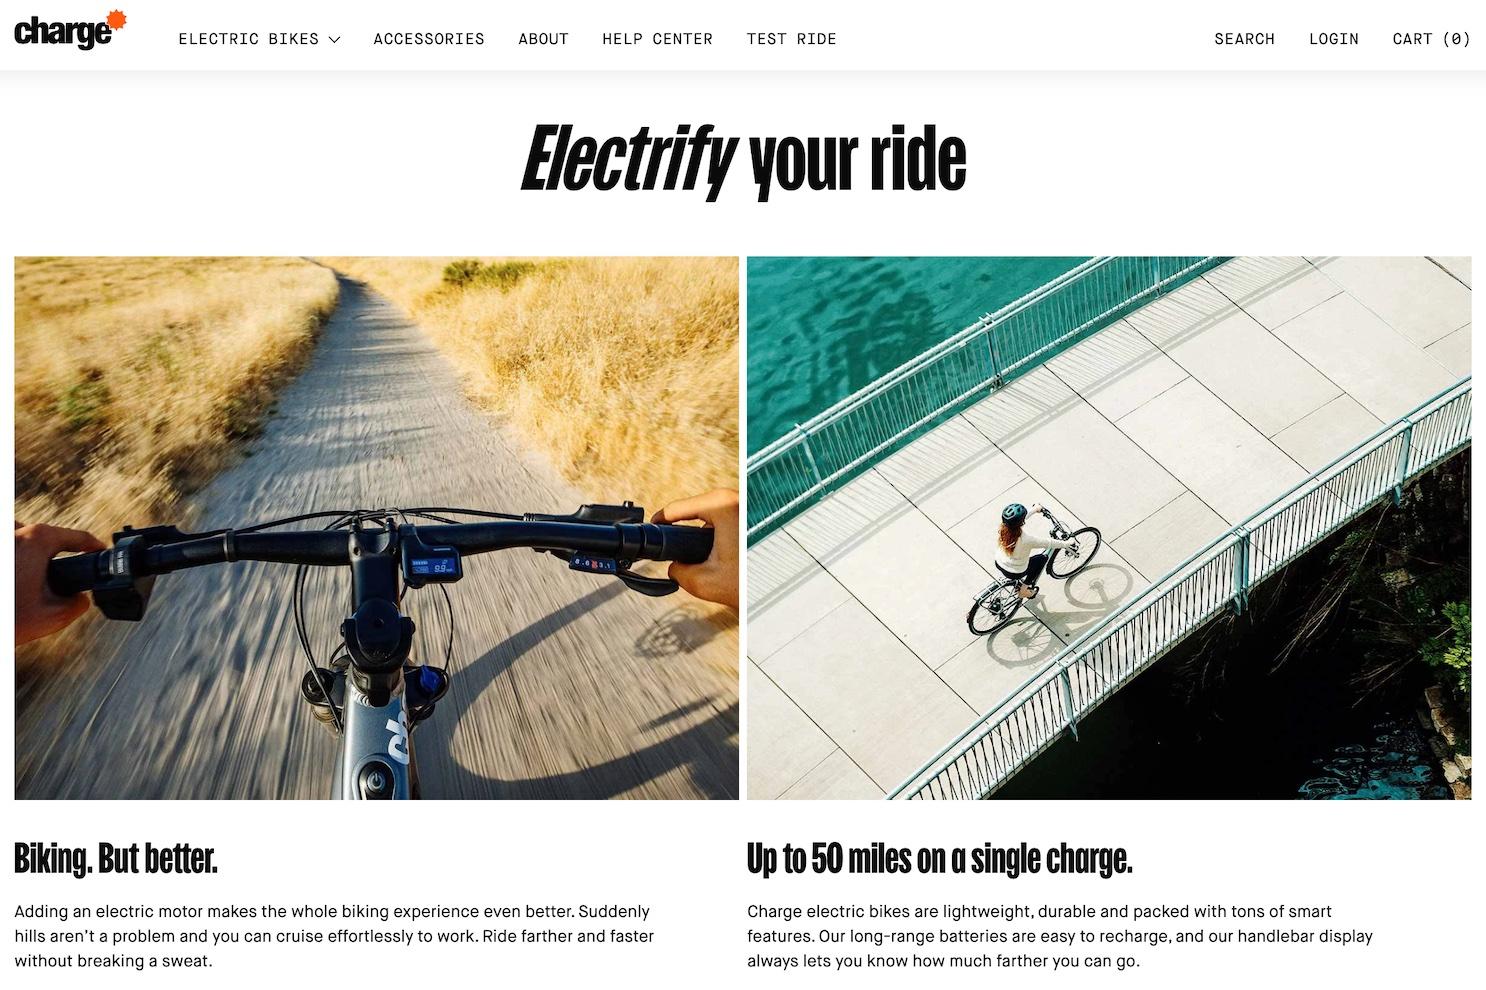 """Electrify your ride"" headline copy."